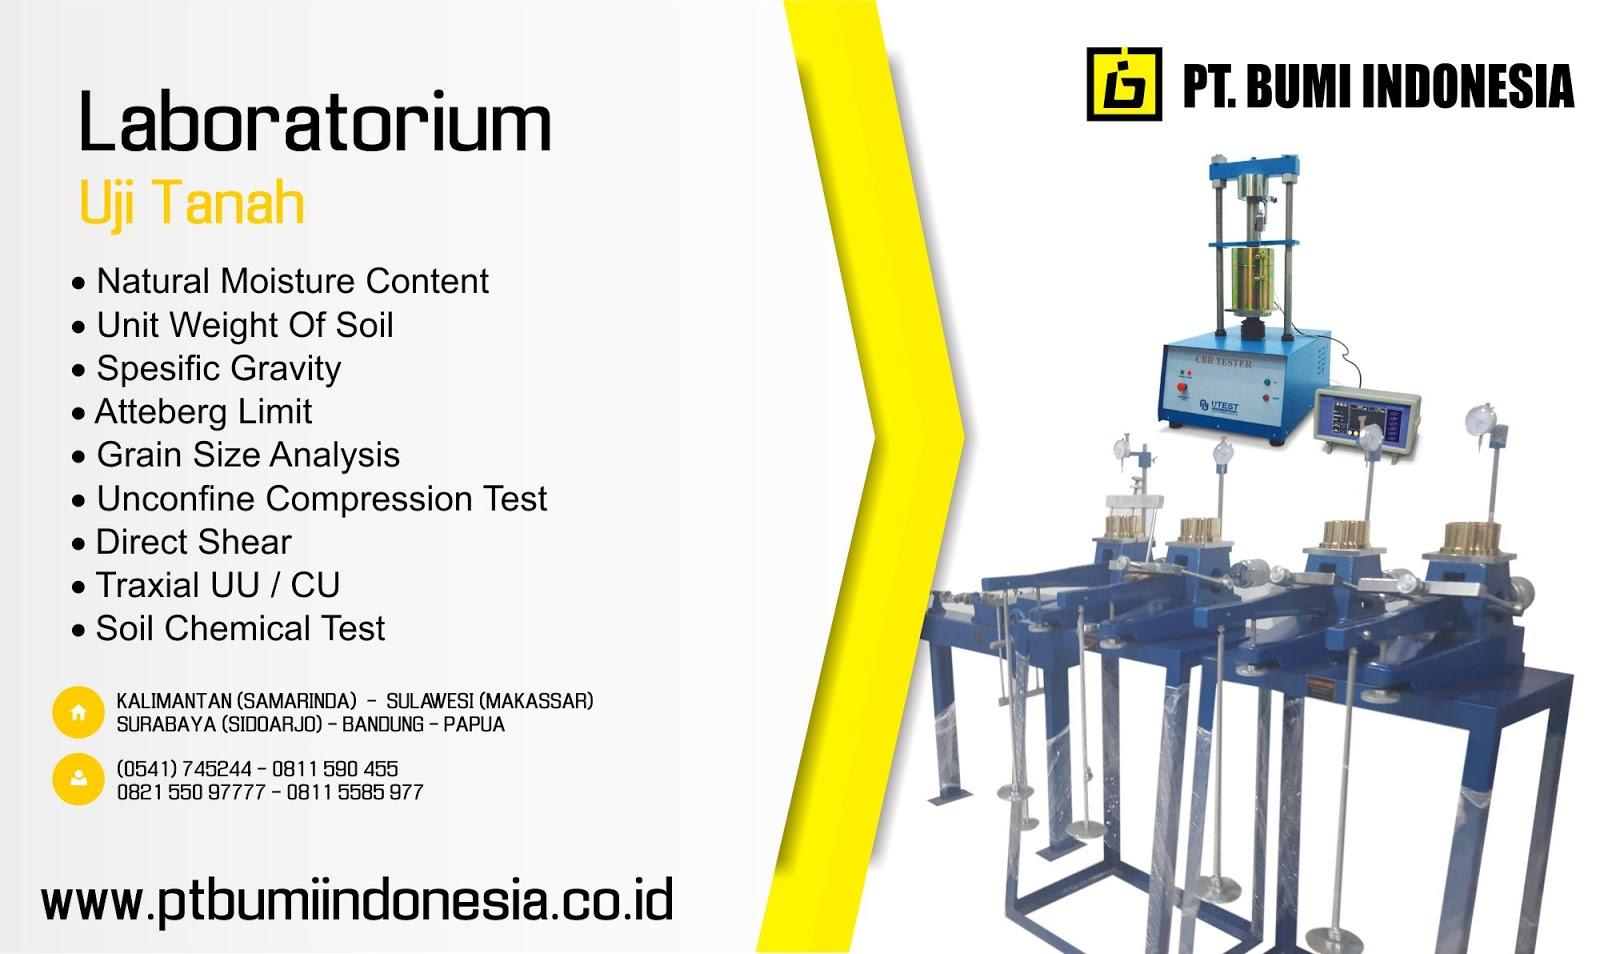 Jasa Sondir Topography Bor Air Lab Uji Tanah Makassar Jasa Sondir Dan Soil Test Sulawesi Tengah Palu Pt Bumi Indonesia